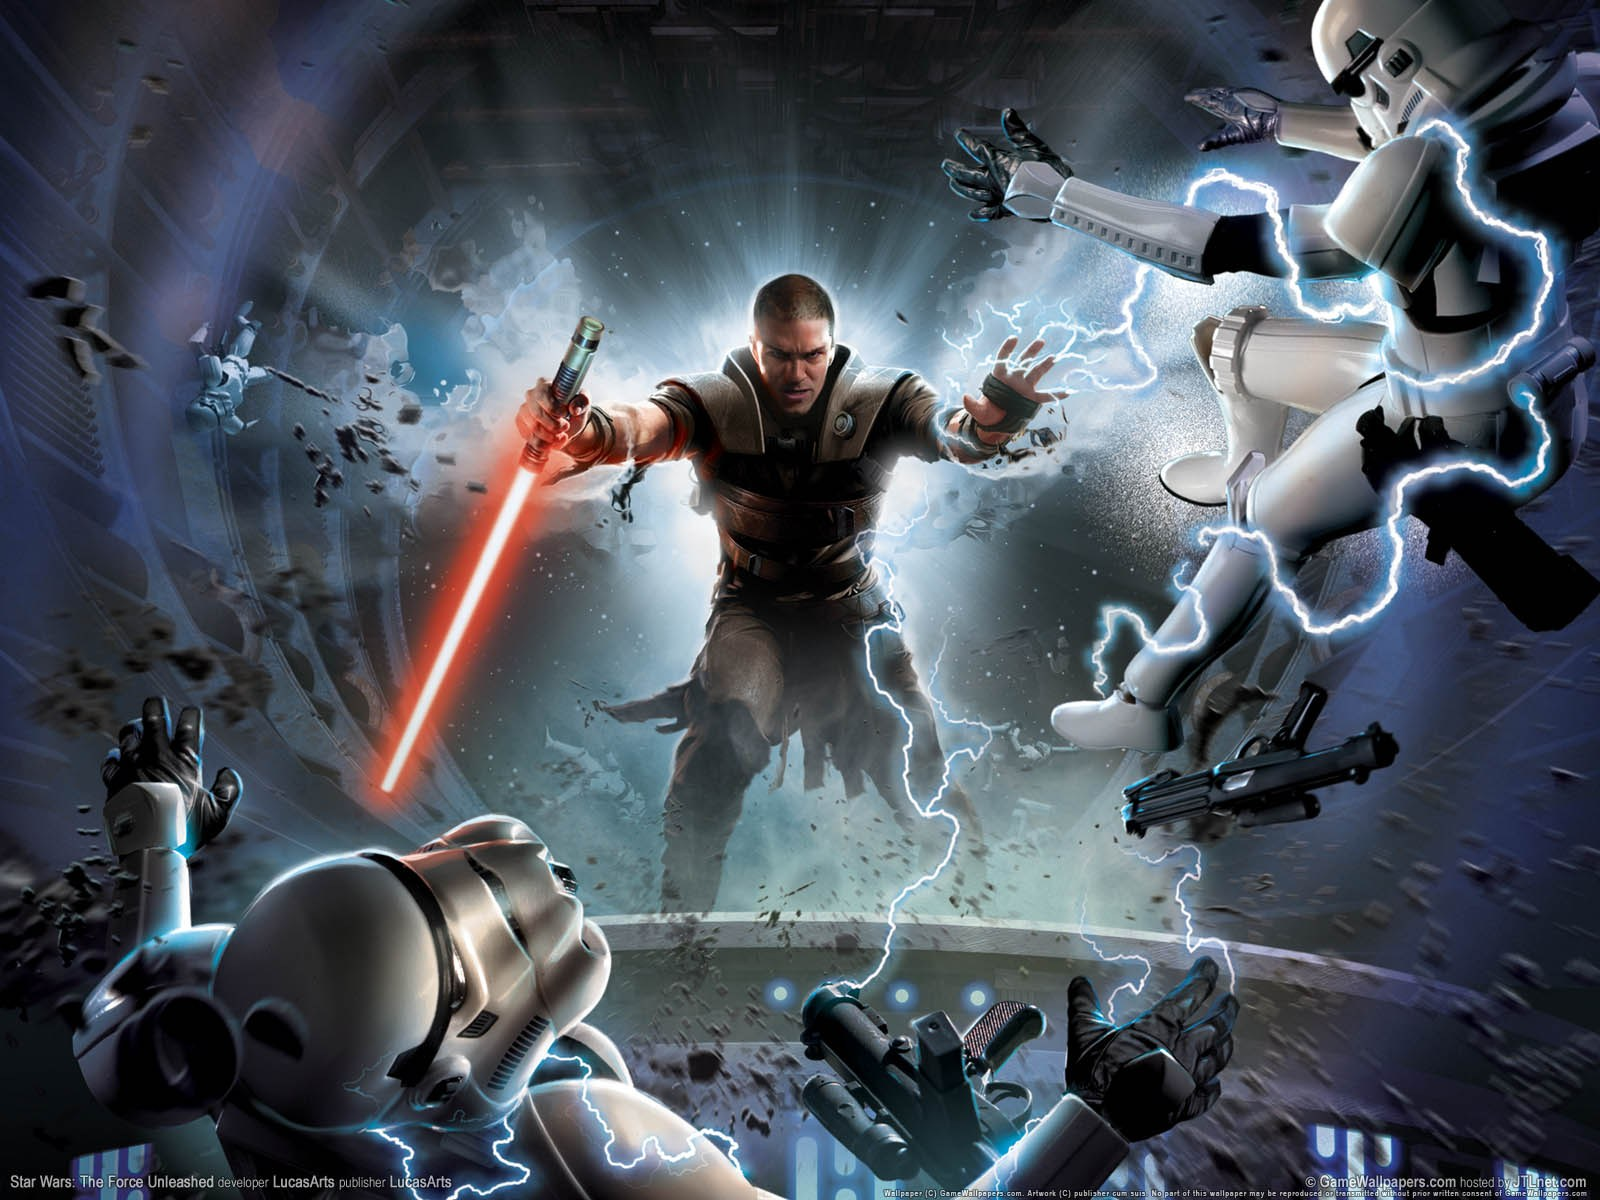 All Best Picos Star Wars Wallpapers Hd Star Wars Wallpaper Widescreen Star Wars 3